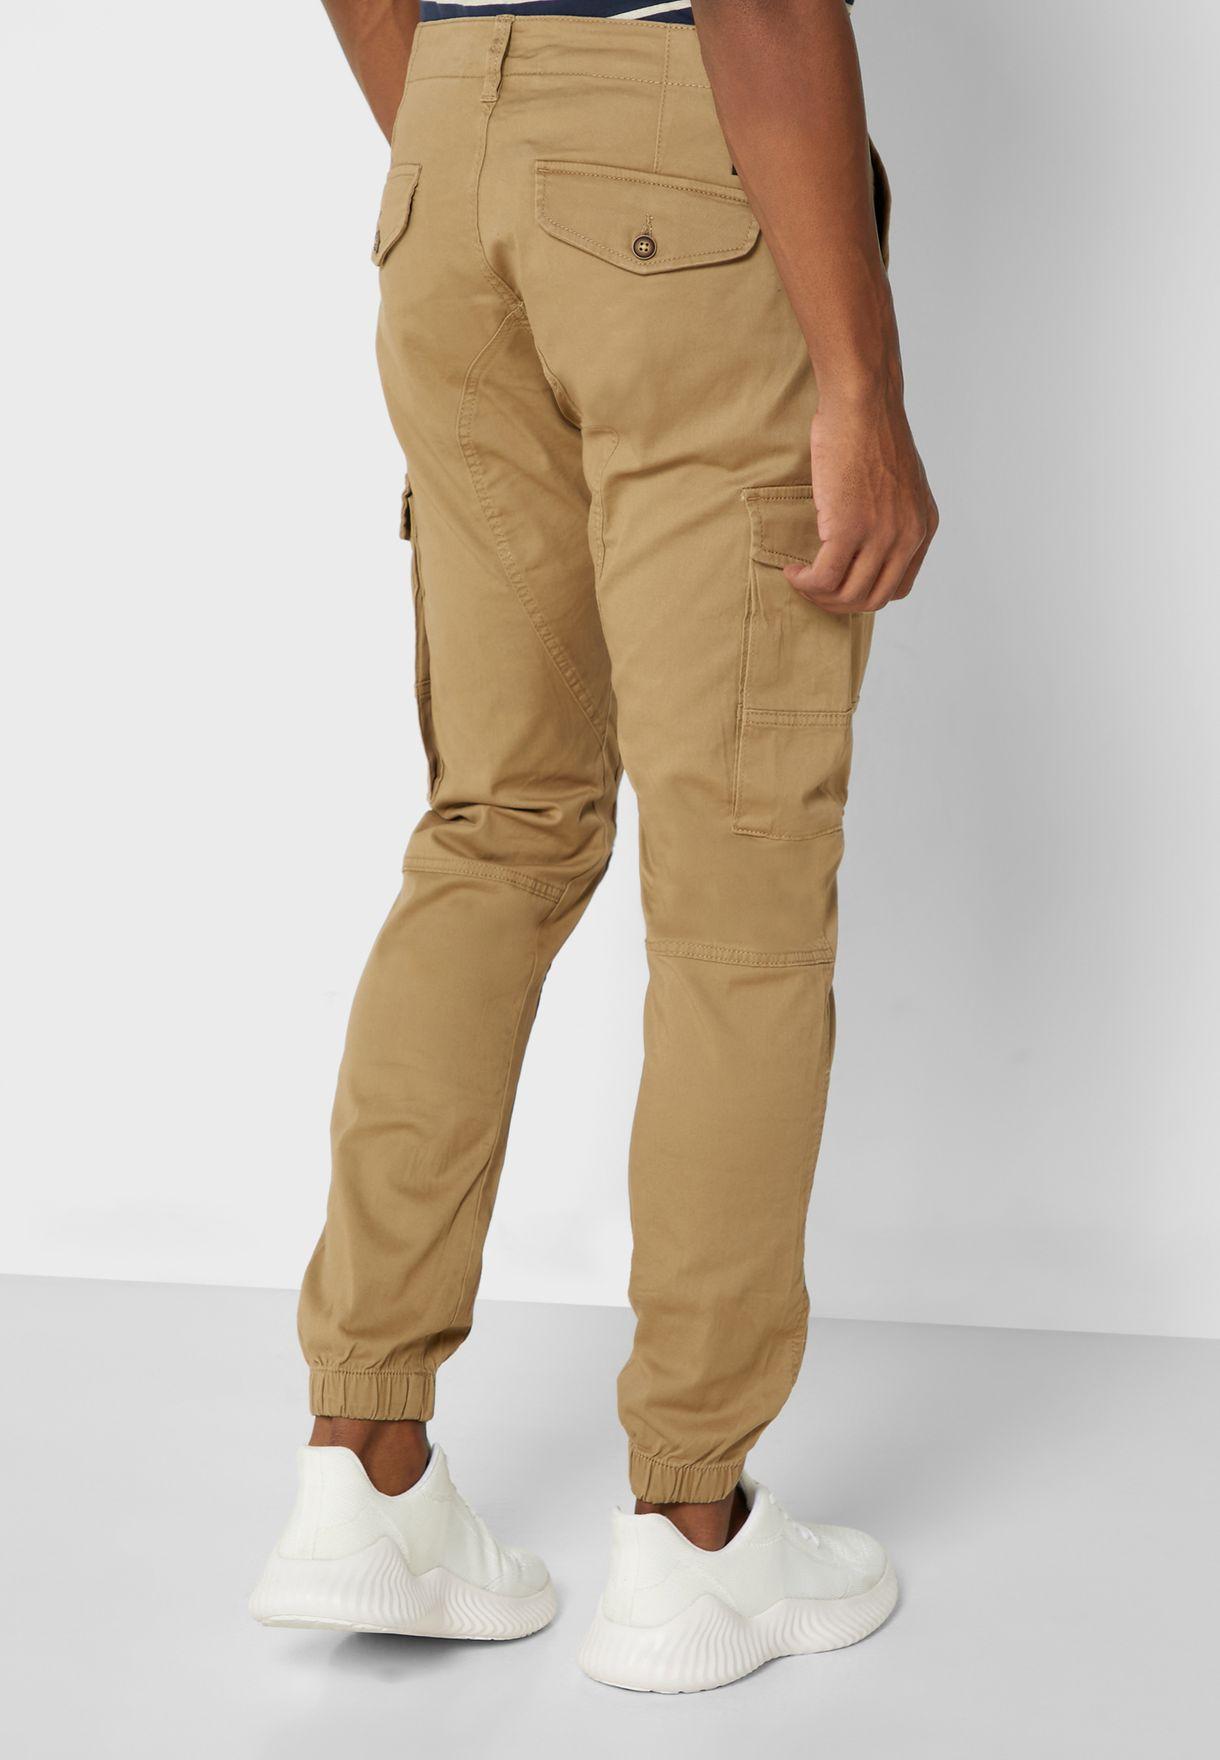 Paul Cuffed Pants